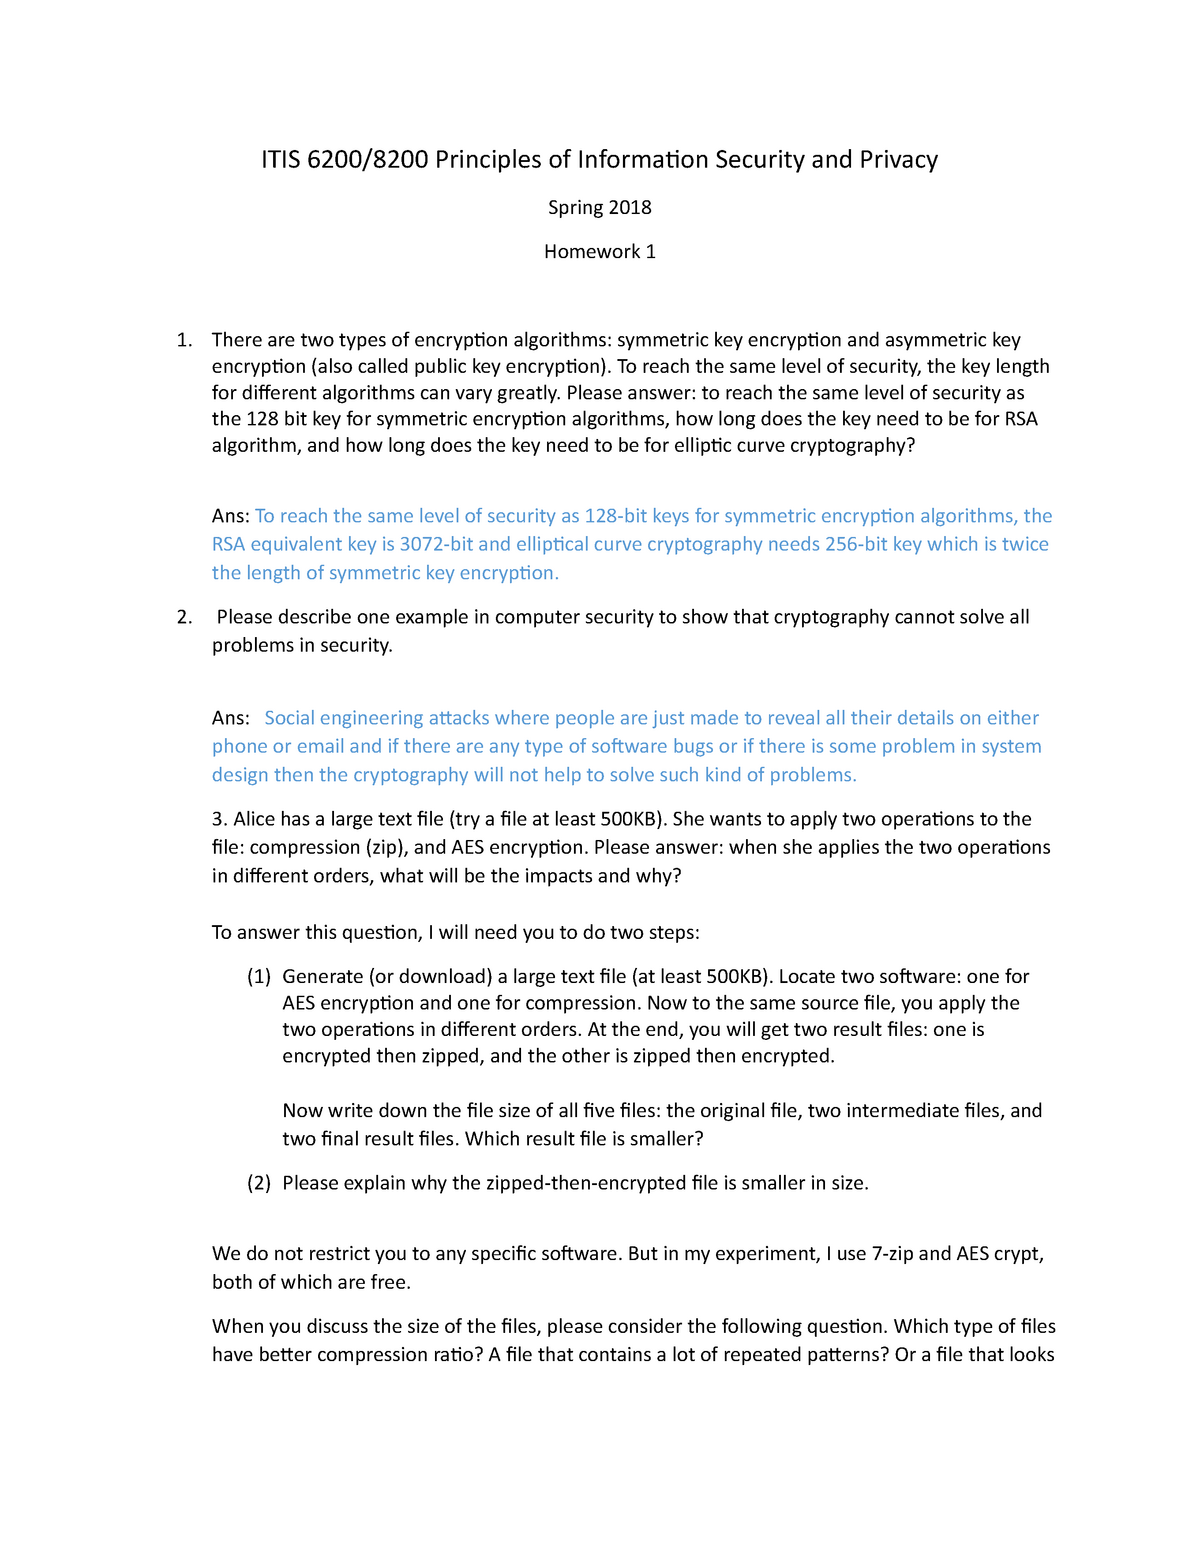 PISP HW01 - ITIS 6200: Prin Info Security & Privacy - StuDocu